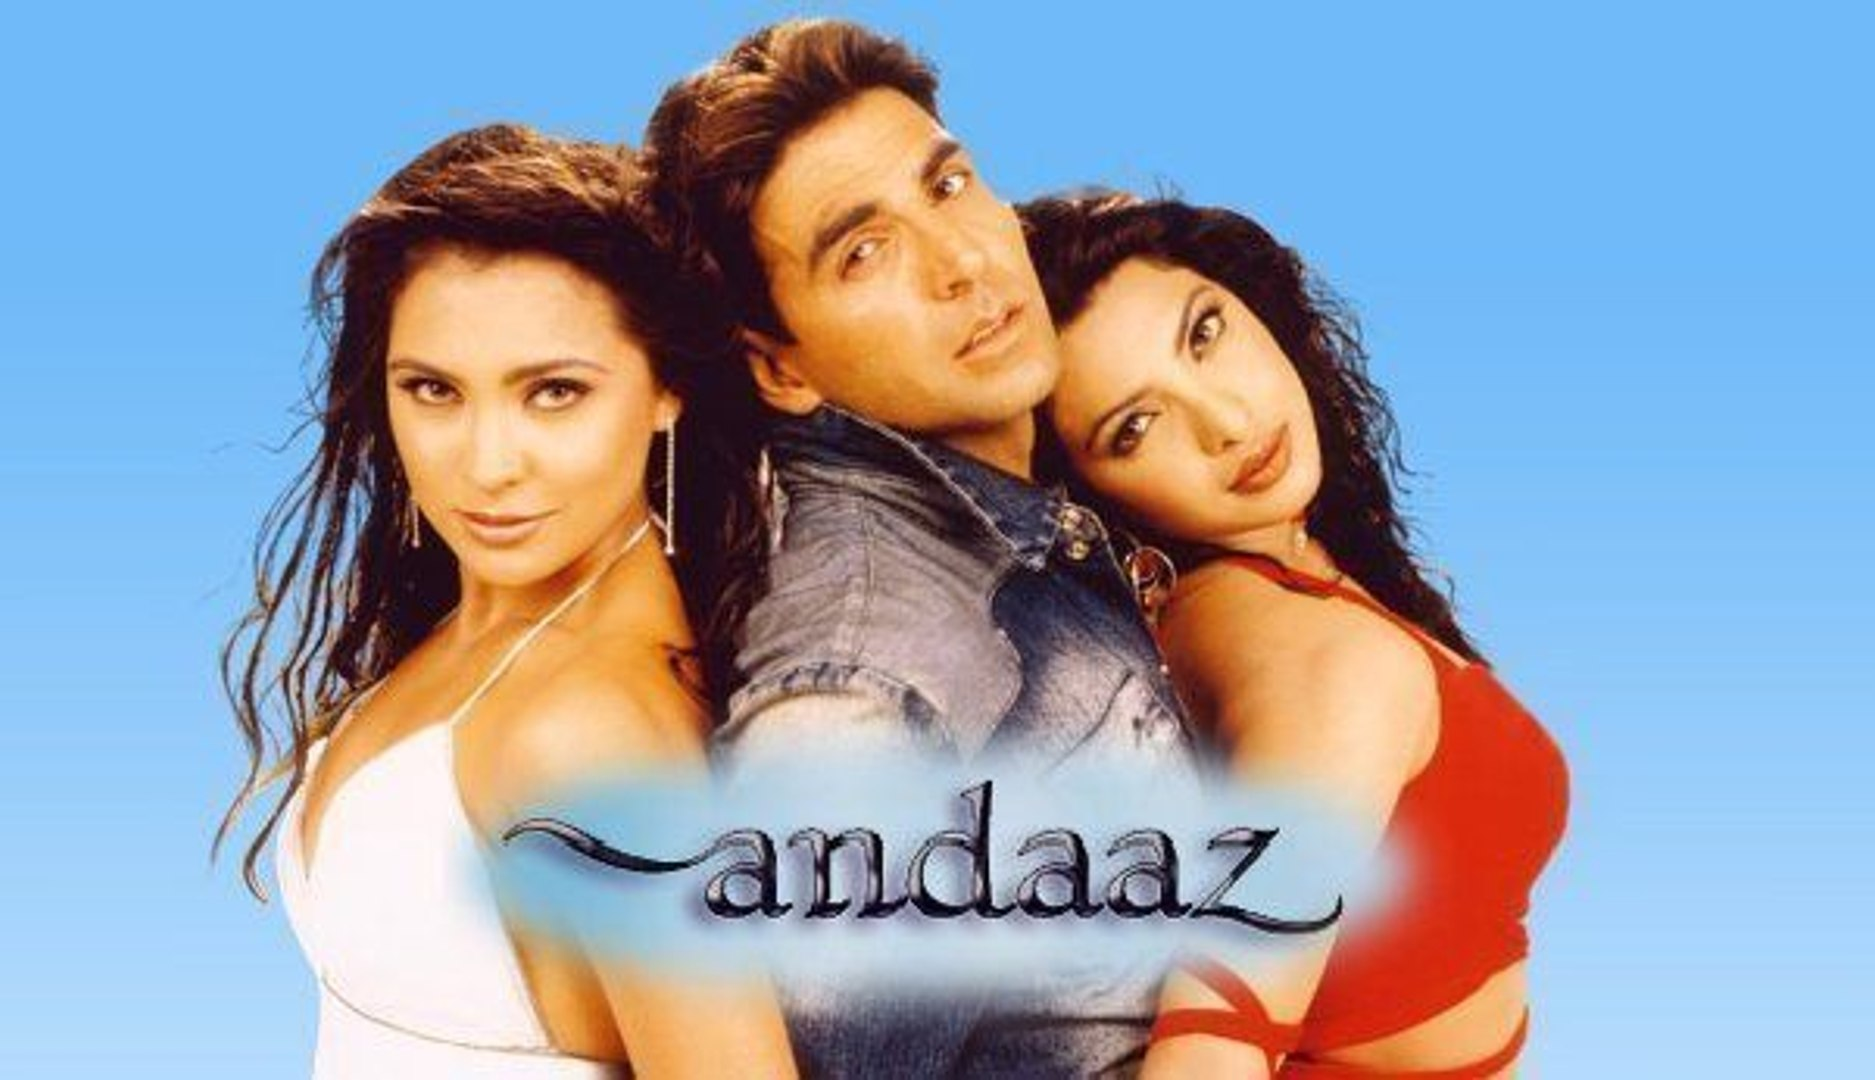 Andaaz - Full Hindi Movie - Akshay Kumar, Priyanka Chopra, Lara Dutta - HD  - cloudypk.com - MoviePlus488 - video dailymotion